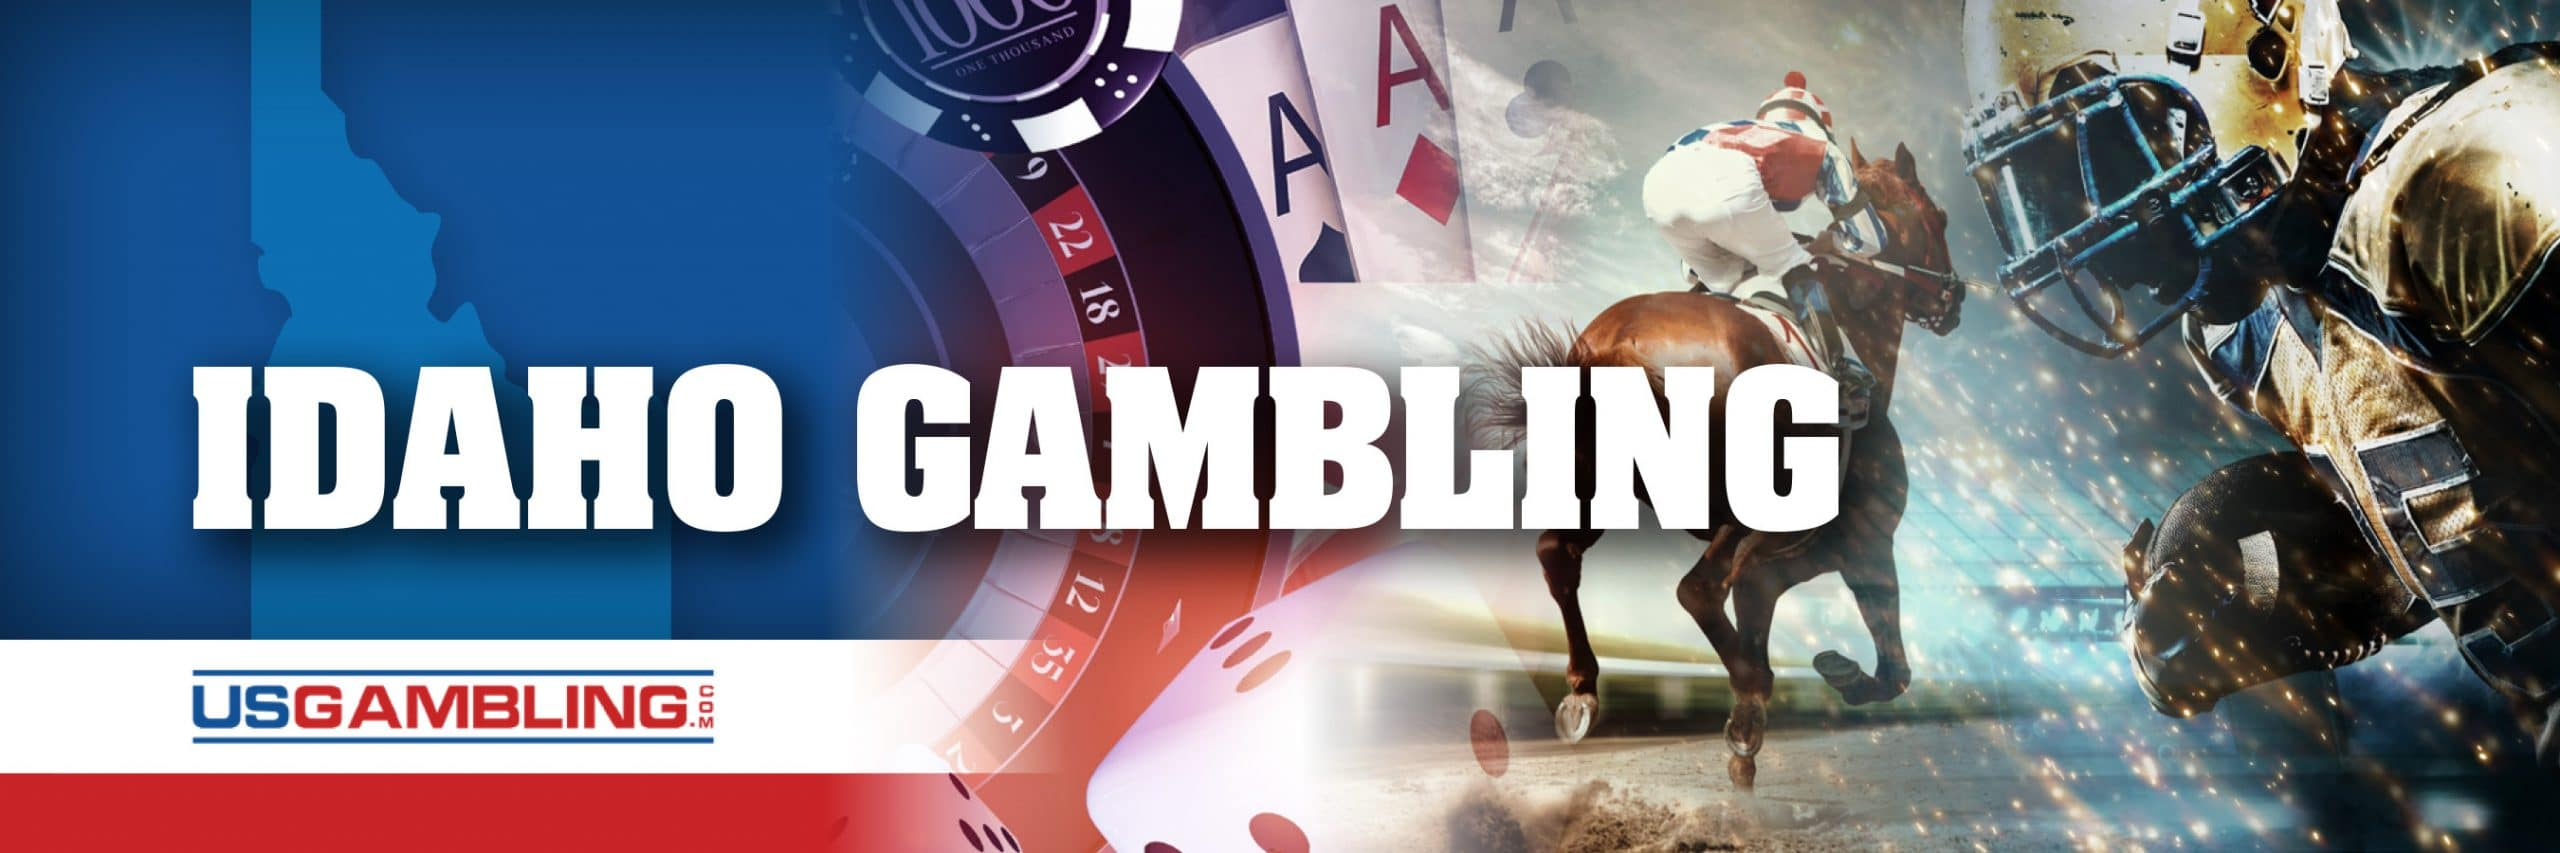 Legal Idaho Gambling